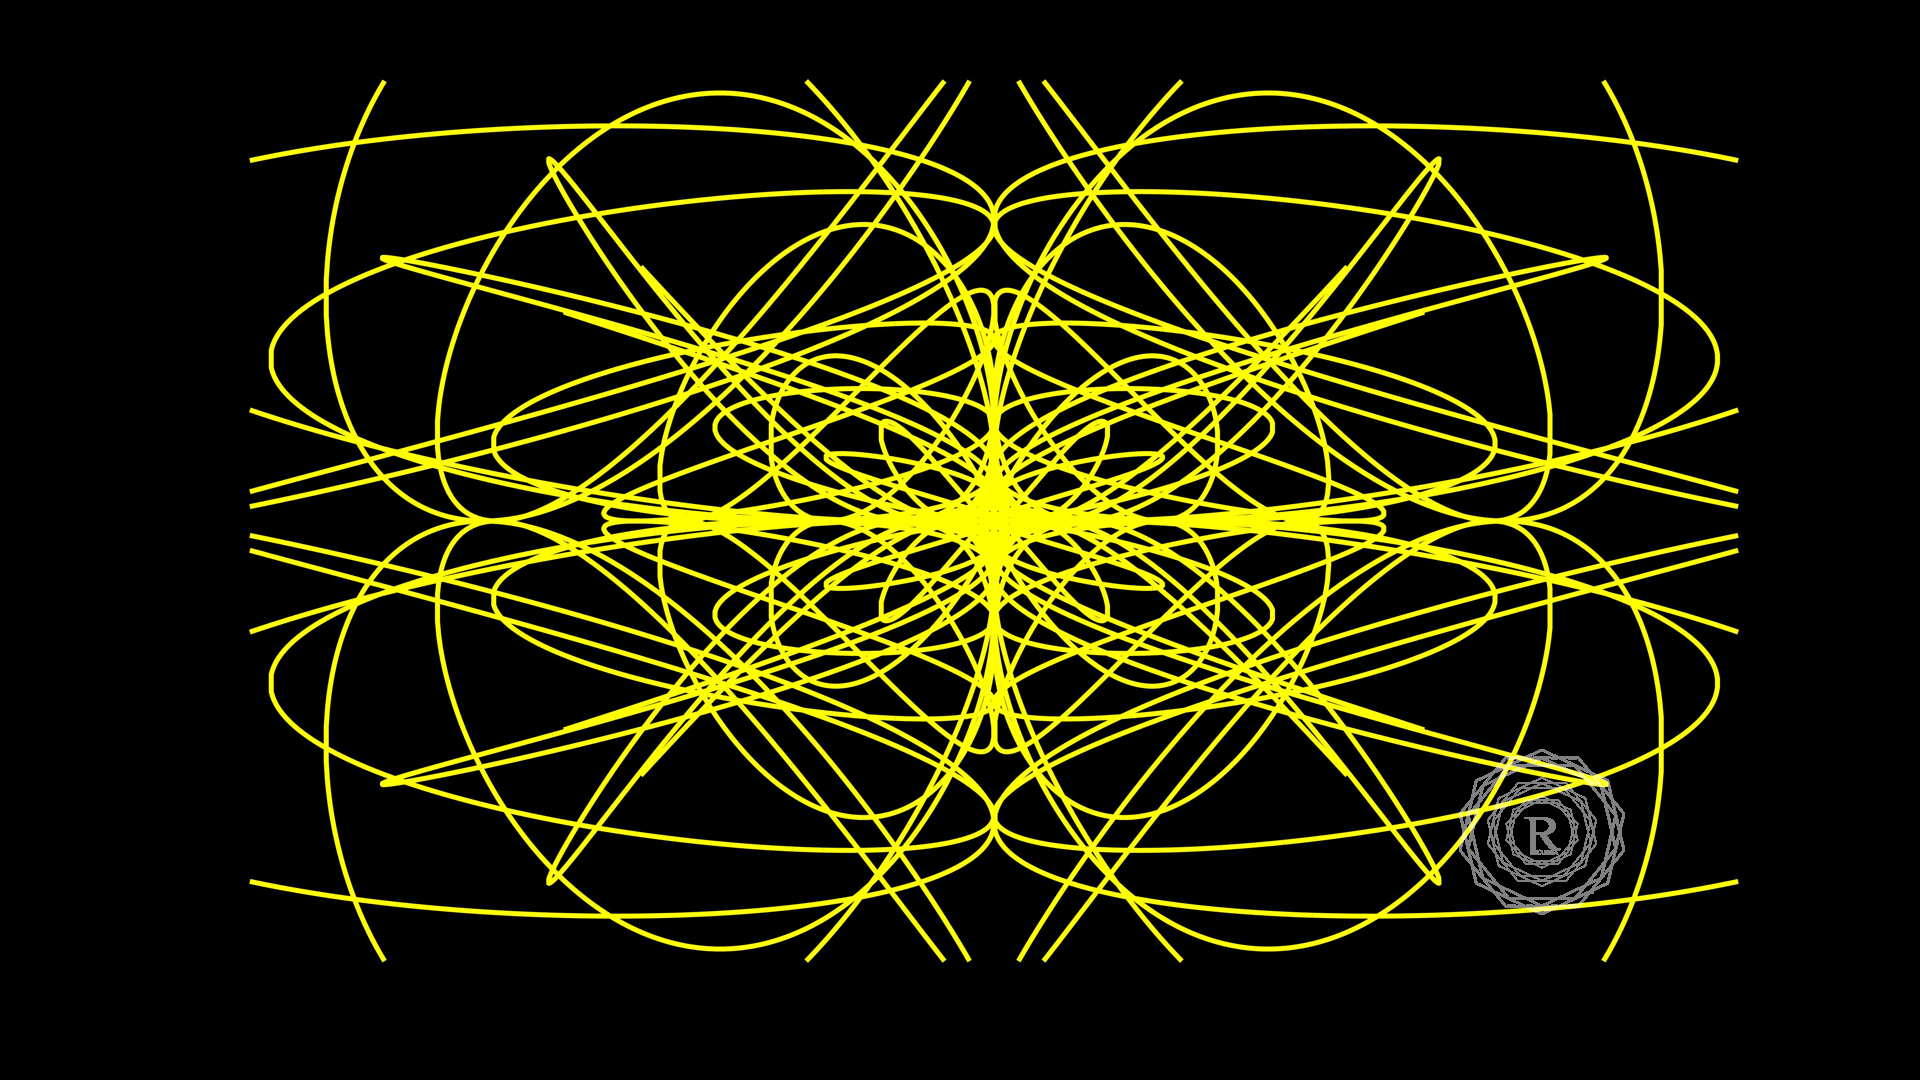 00084Resized_Geometry_copyright_Recursia